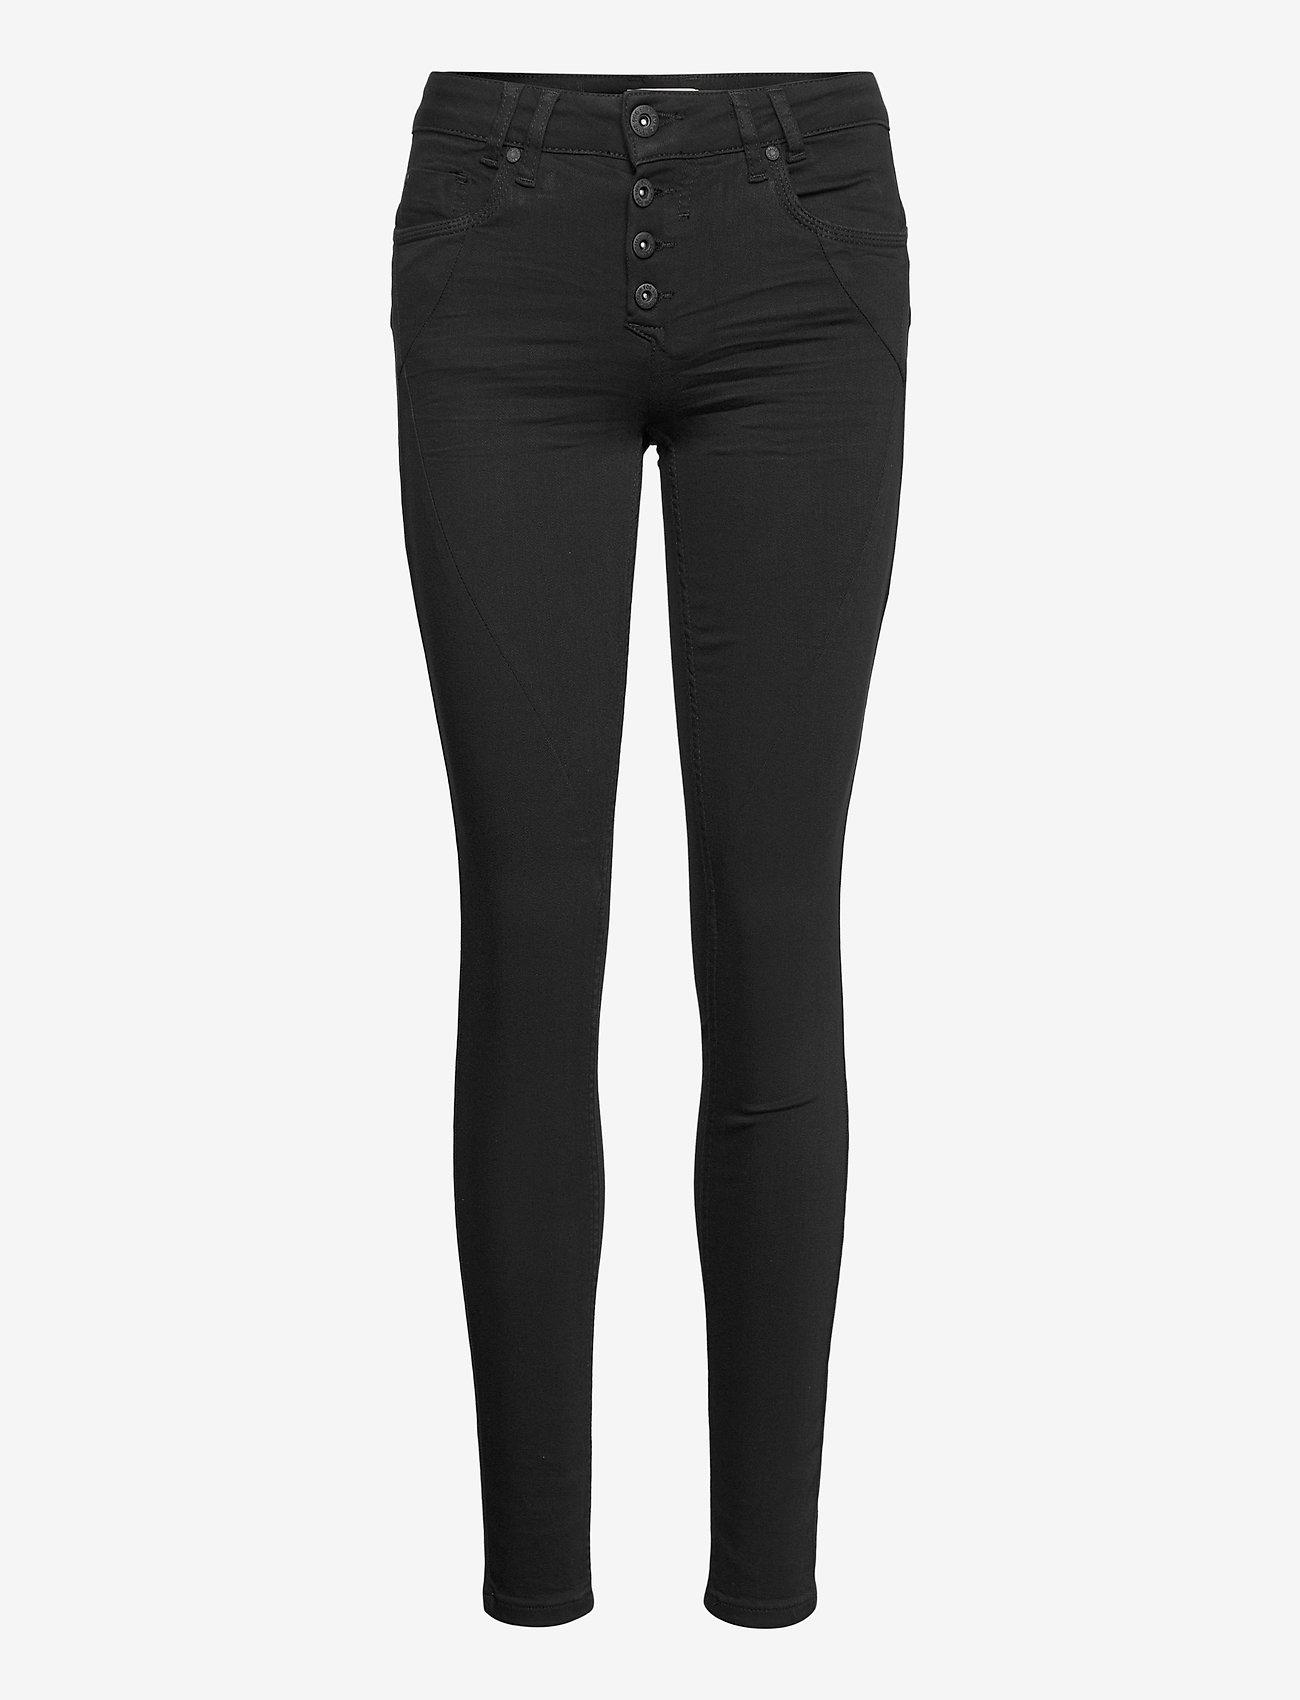 Pulz Jeans - PZANNA Jeans Skinny Leg Stay Black - skinny jeans - black denim - 0